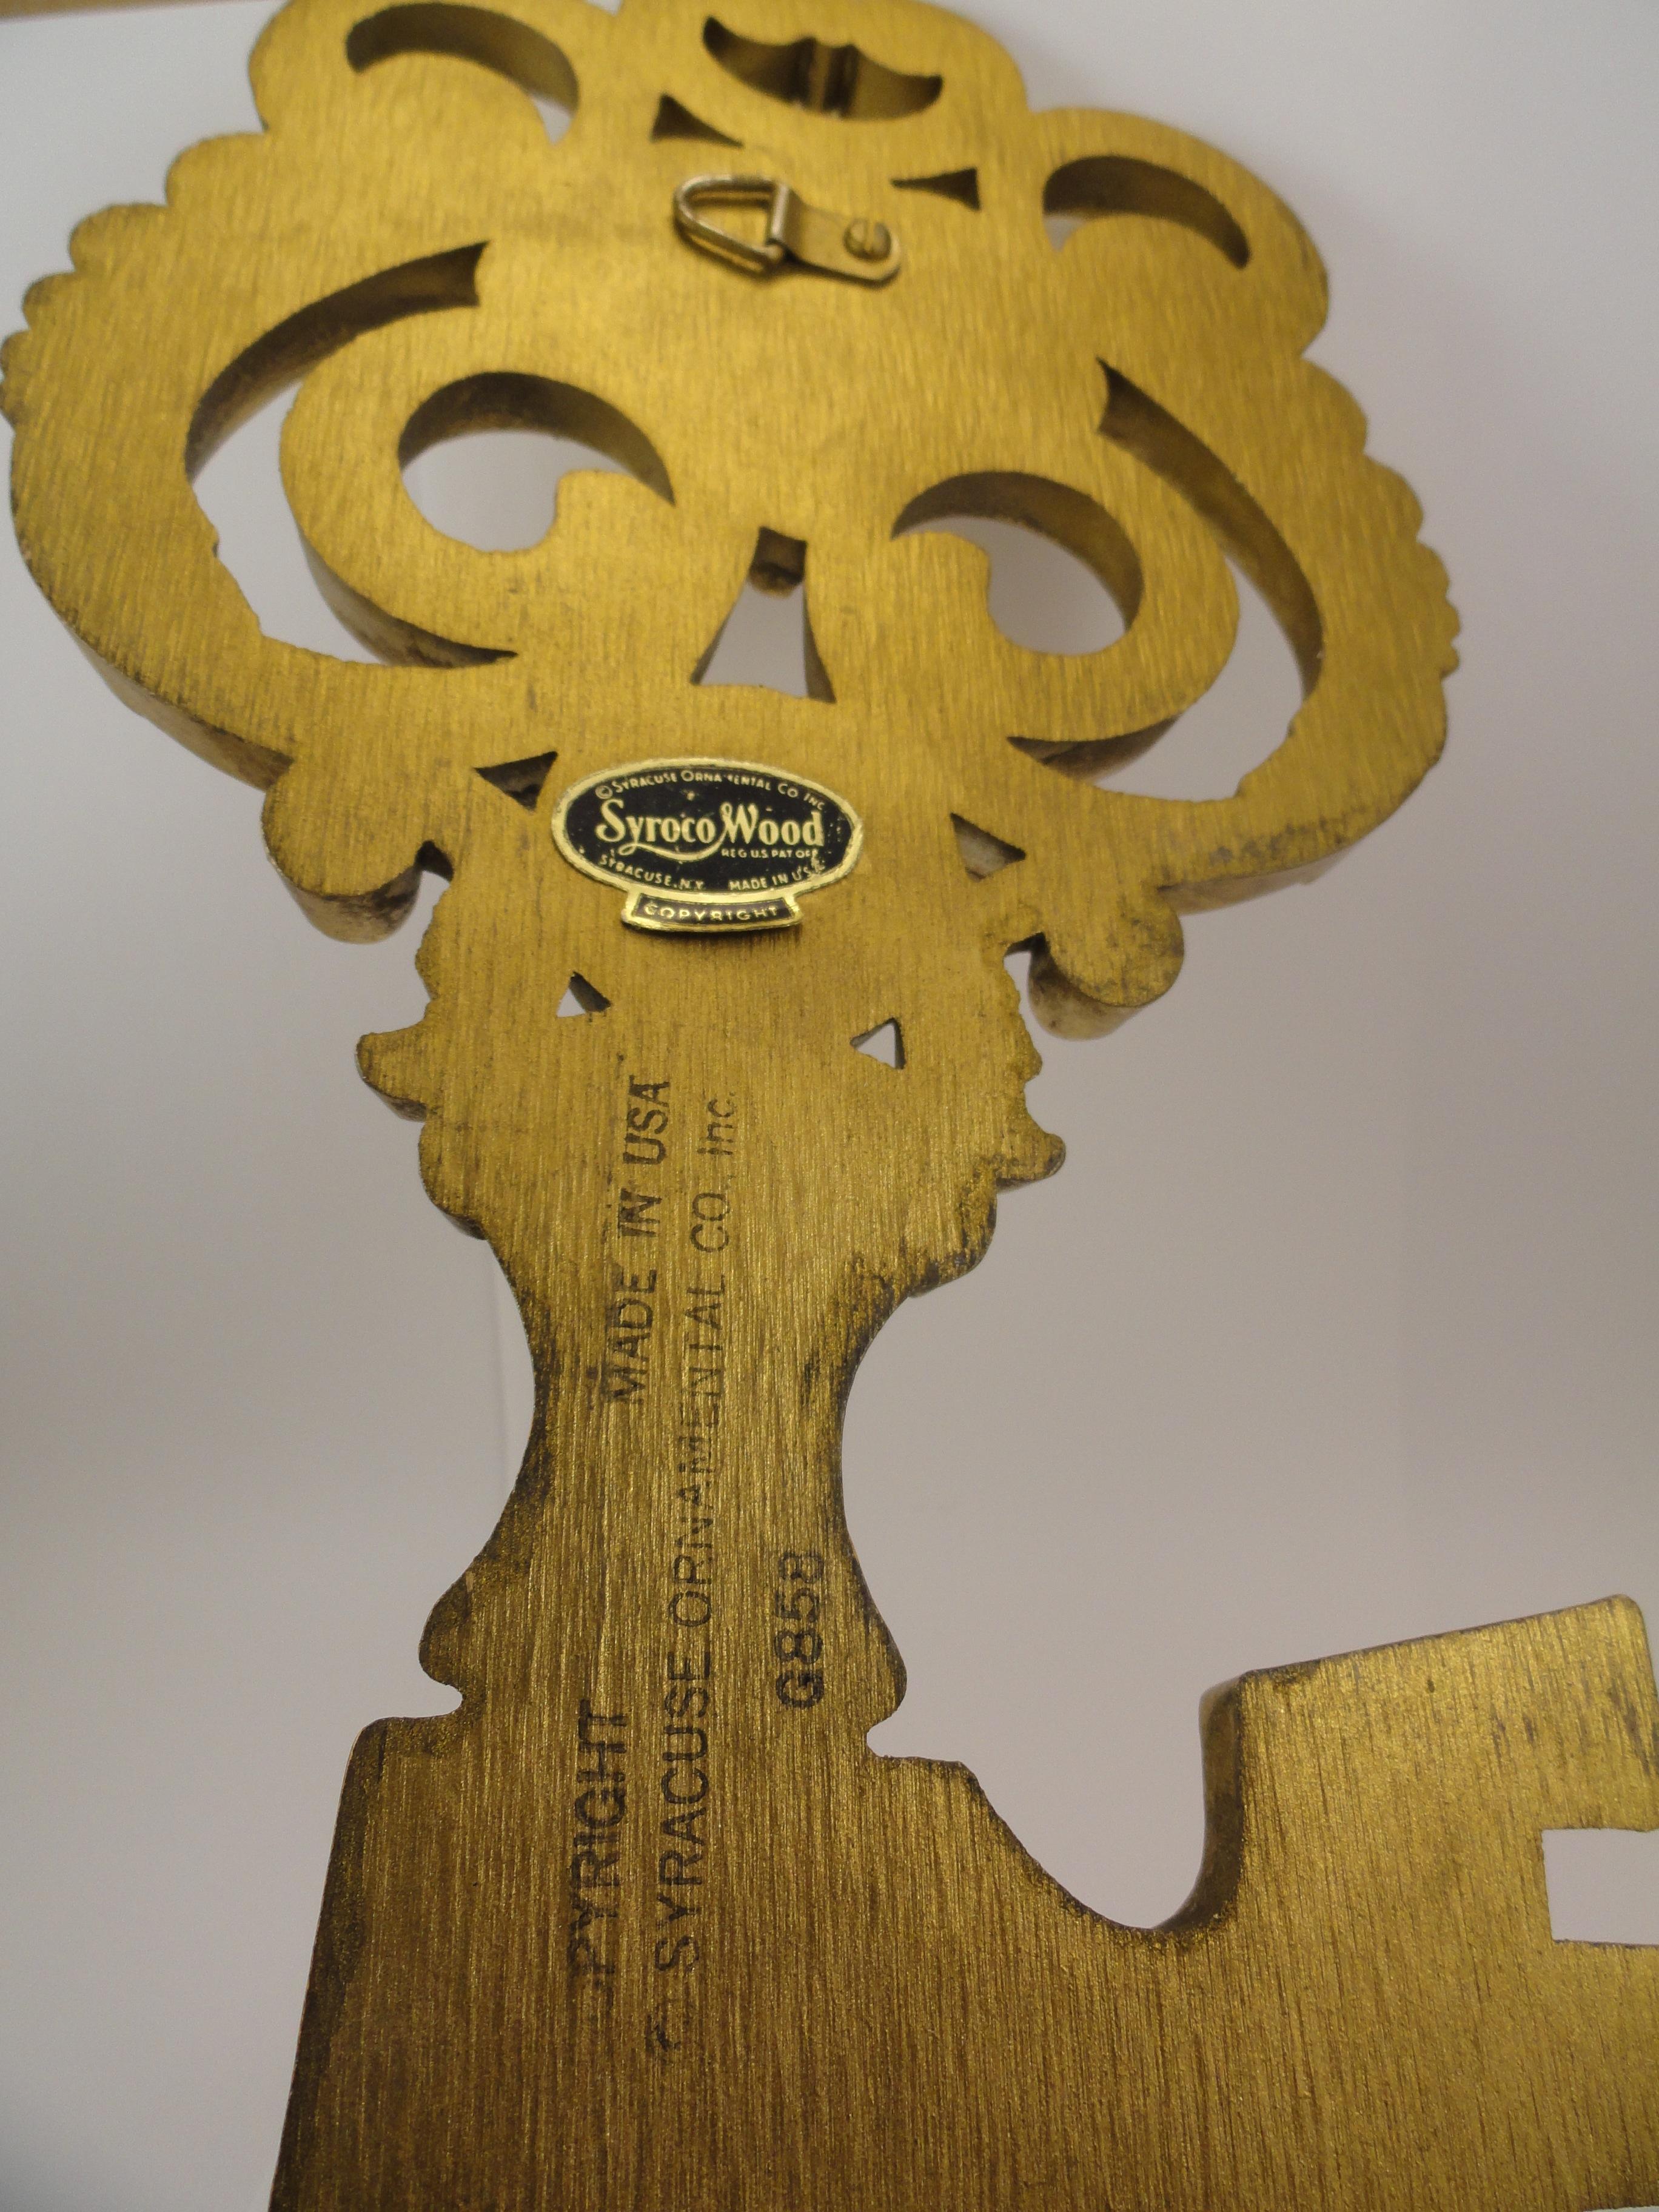 Vintage Gold Syroco Wood Wall Hanging Skeleton Key - Fleur De Lis - Syracuse Ornamental Co.